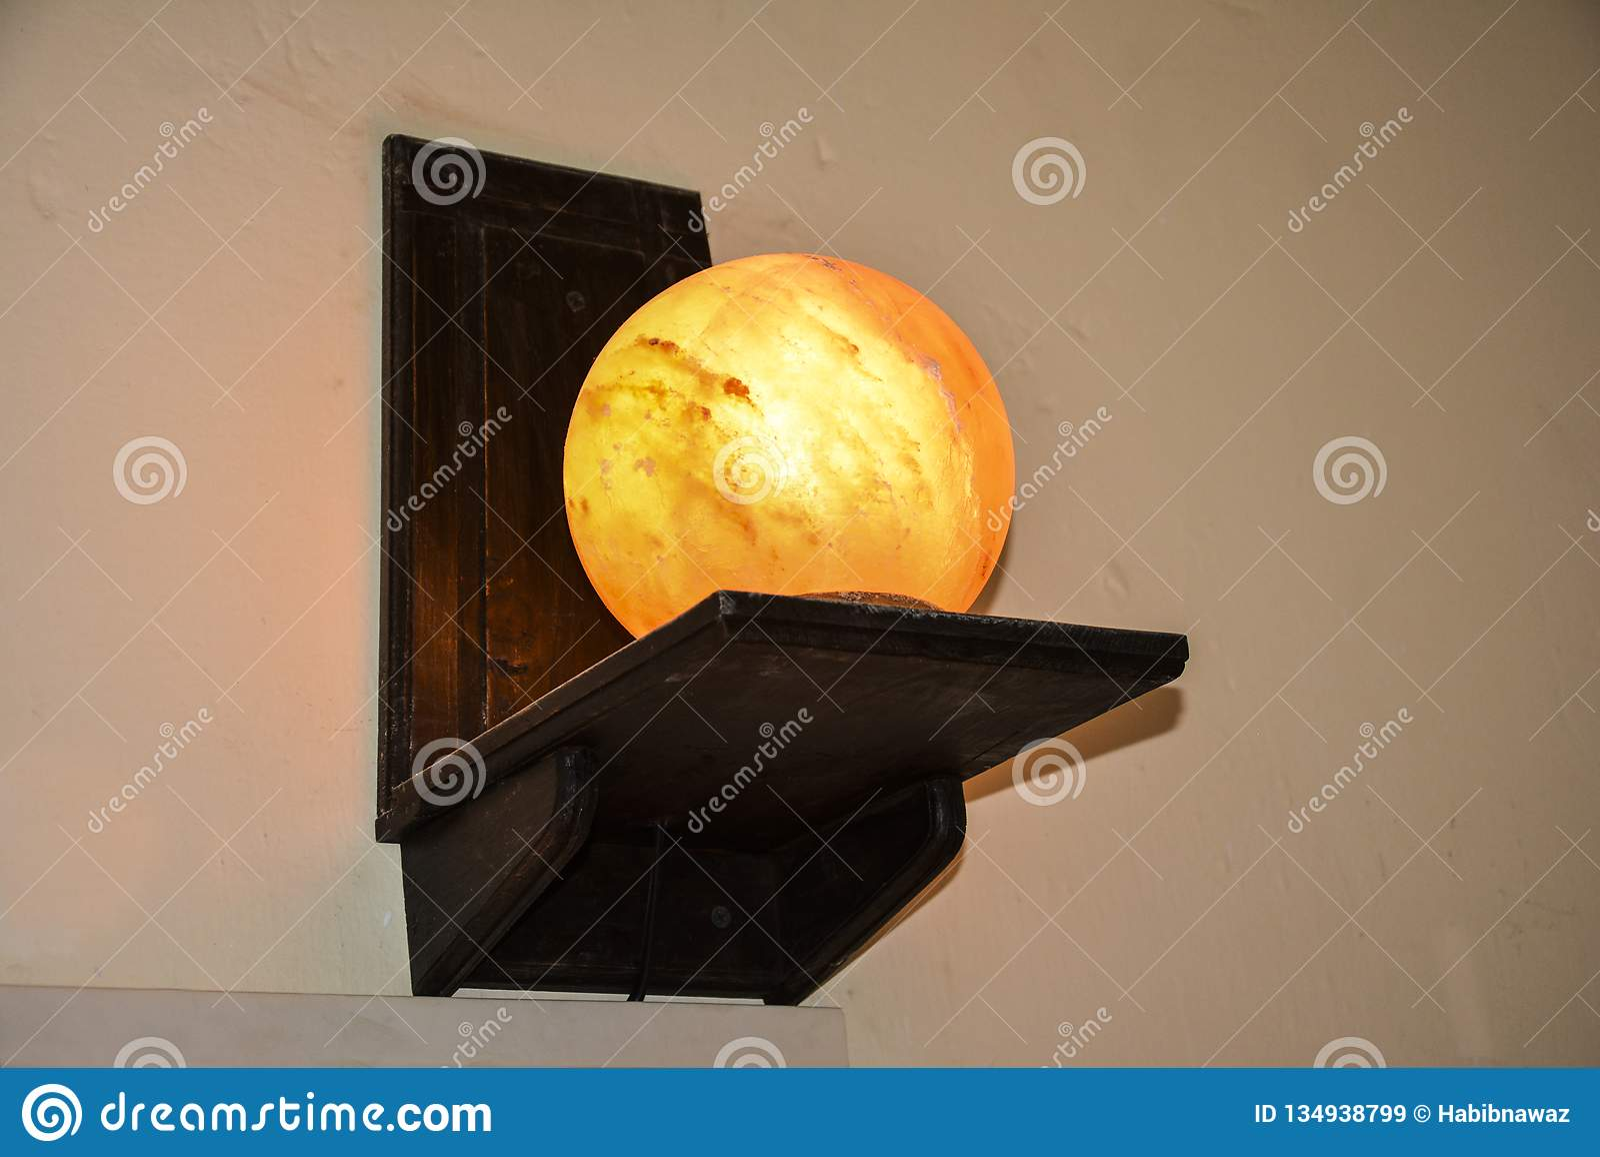 Lâmpada de sal da bola nos suportes de prateleira de madeira | Sal Himalaia